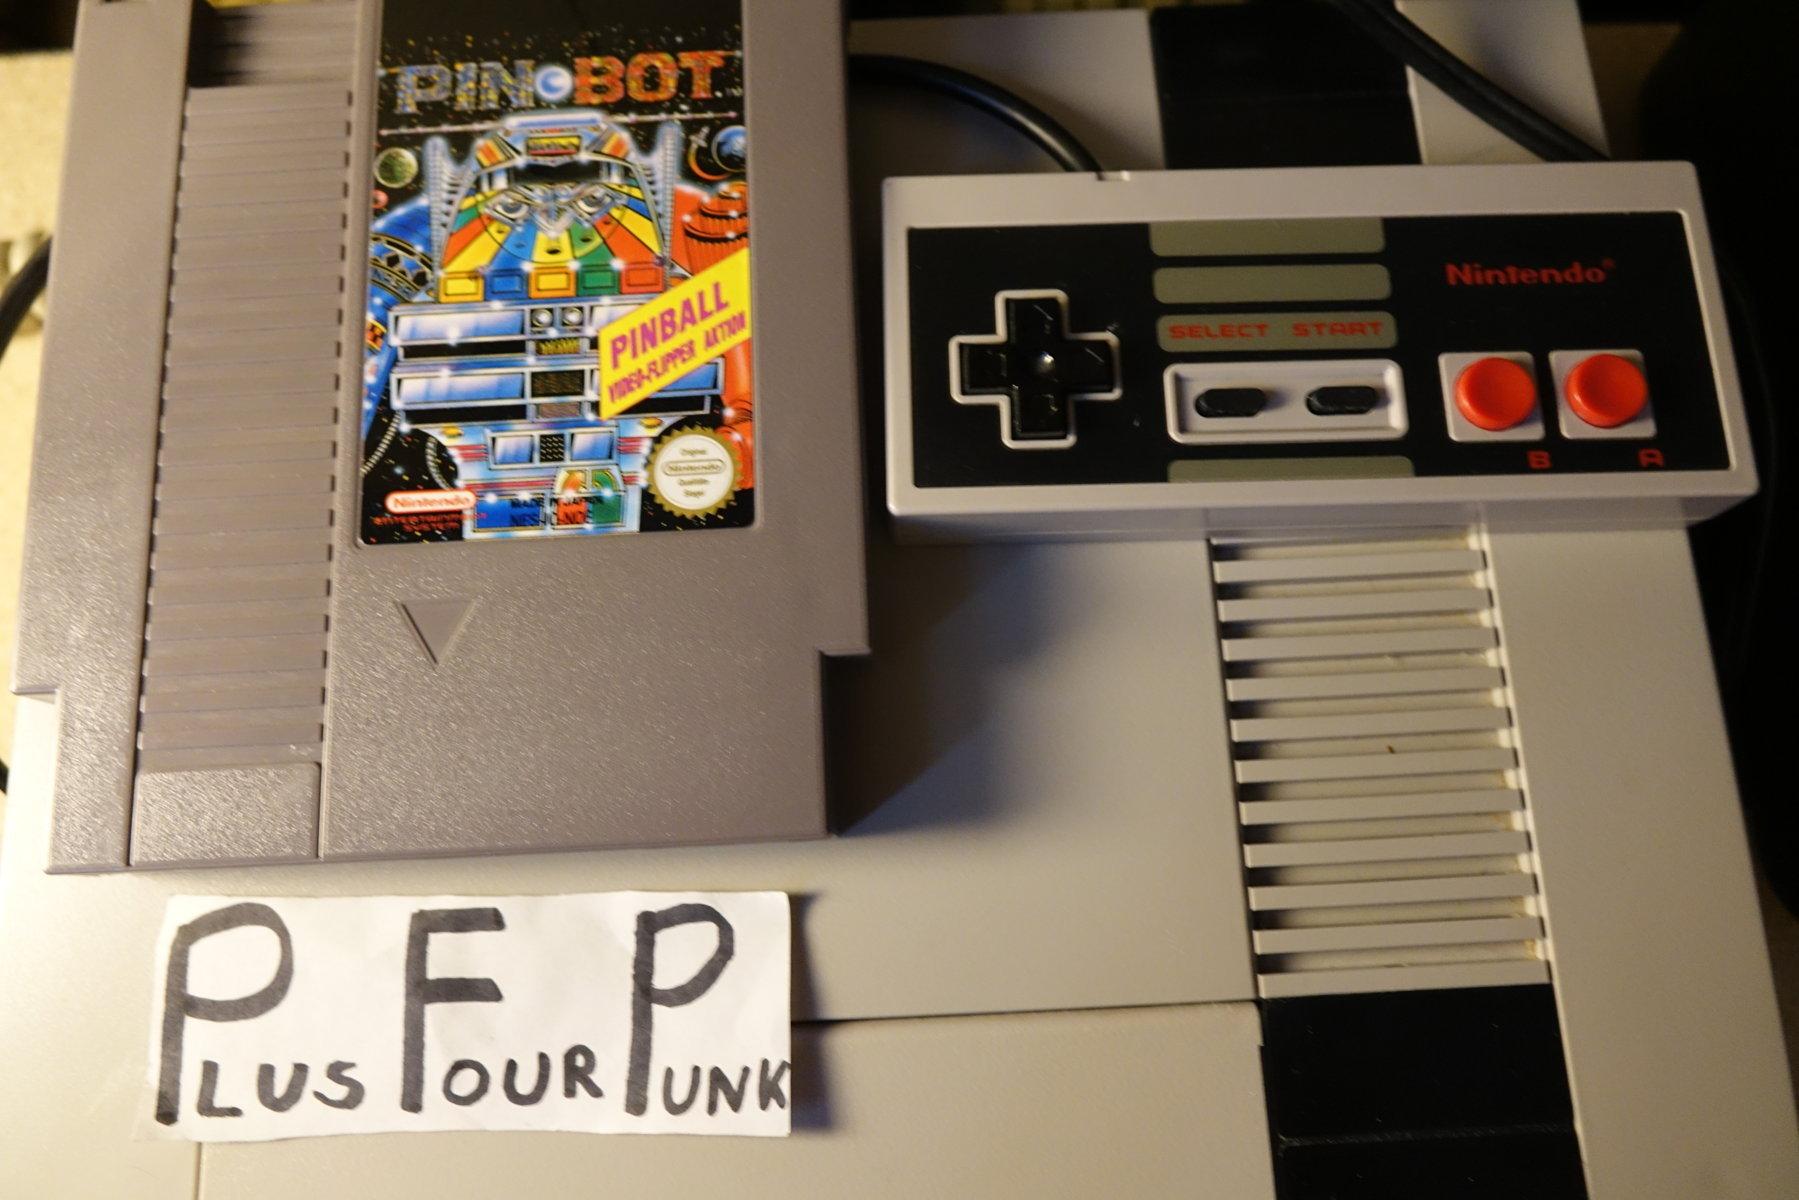 plus4punk: Pin*Bot (NES/Famicom) 3,940,610 points on 2020-06-10 15:15:45